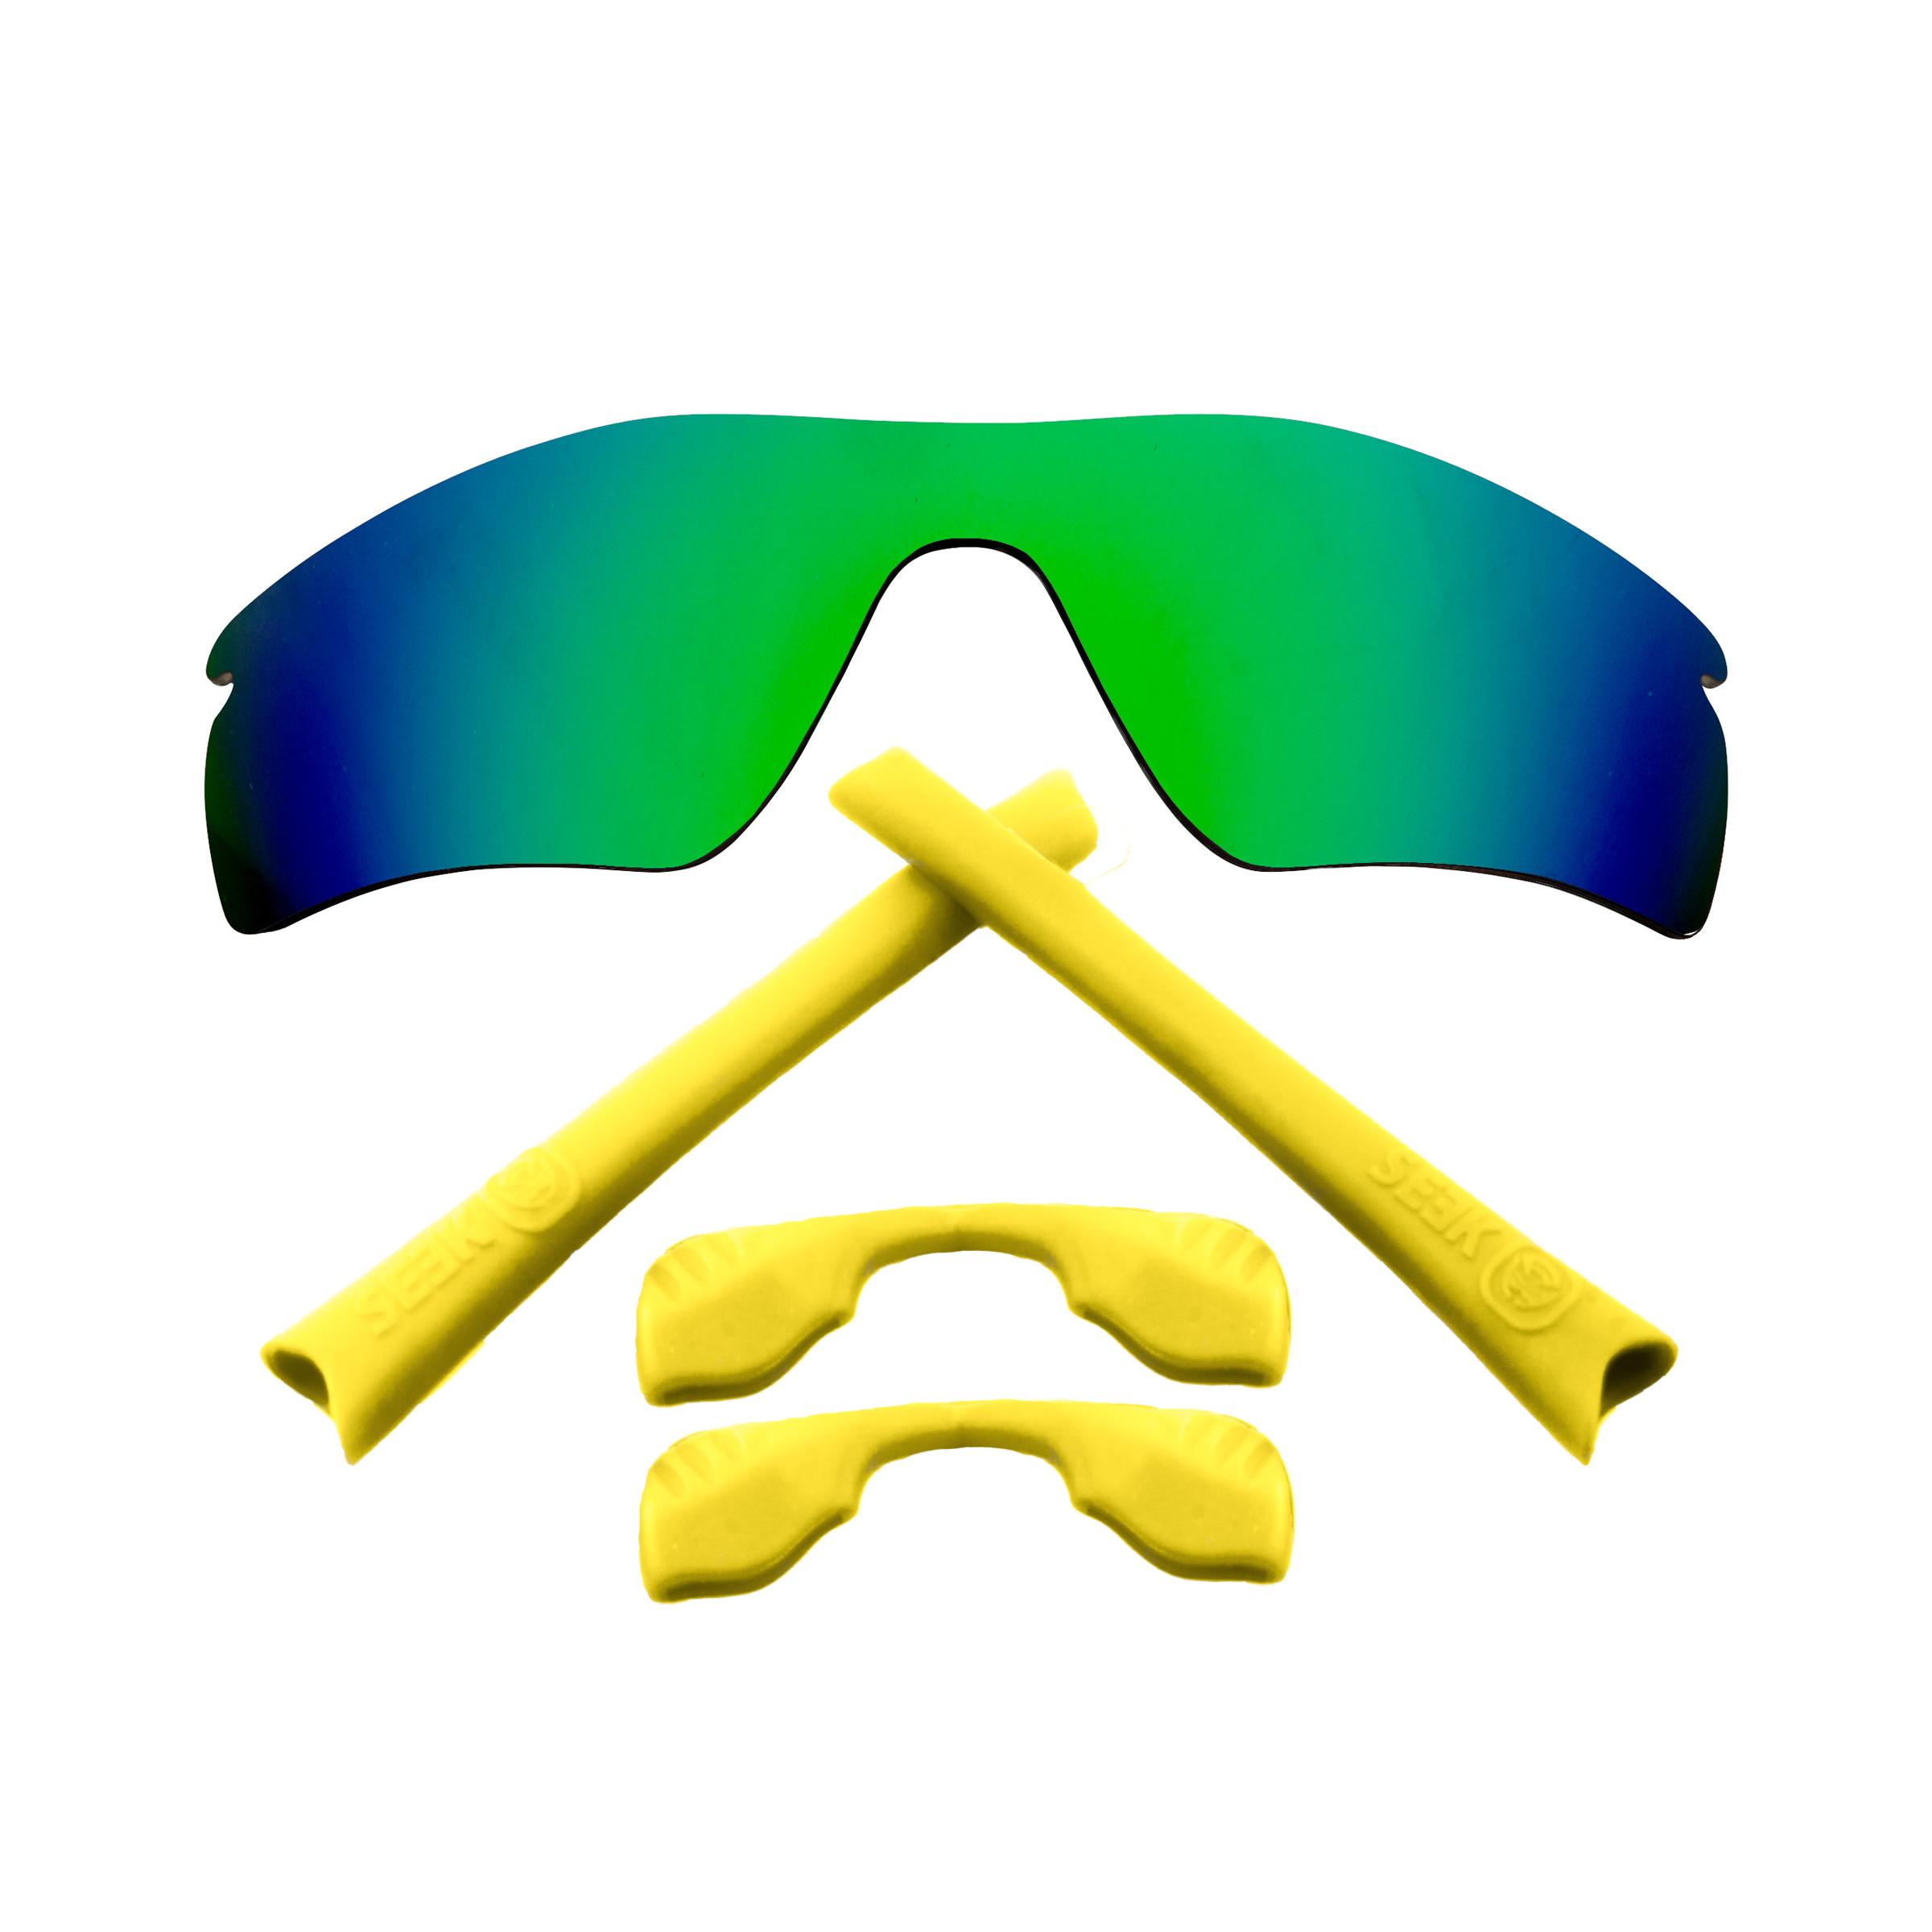 bf0de9fea30 RADAR PATH Polarized Lenses   Accessories Kit Green   Yellow by SEEK ...